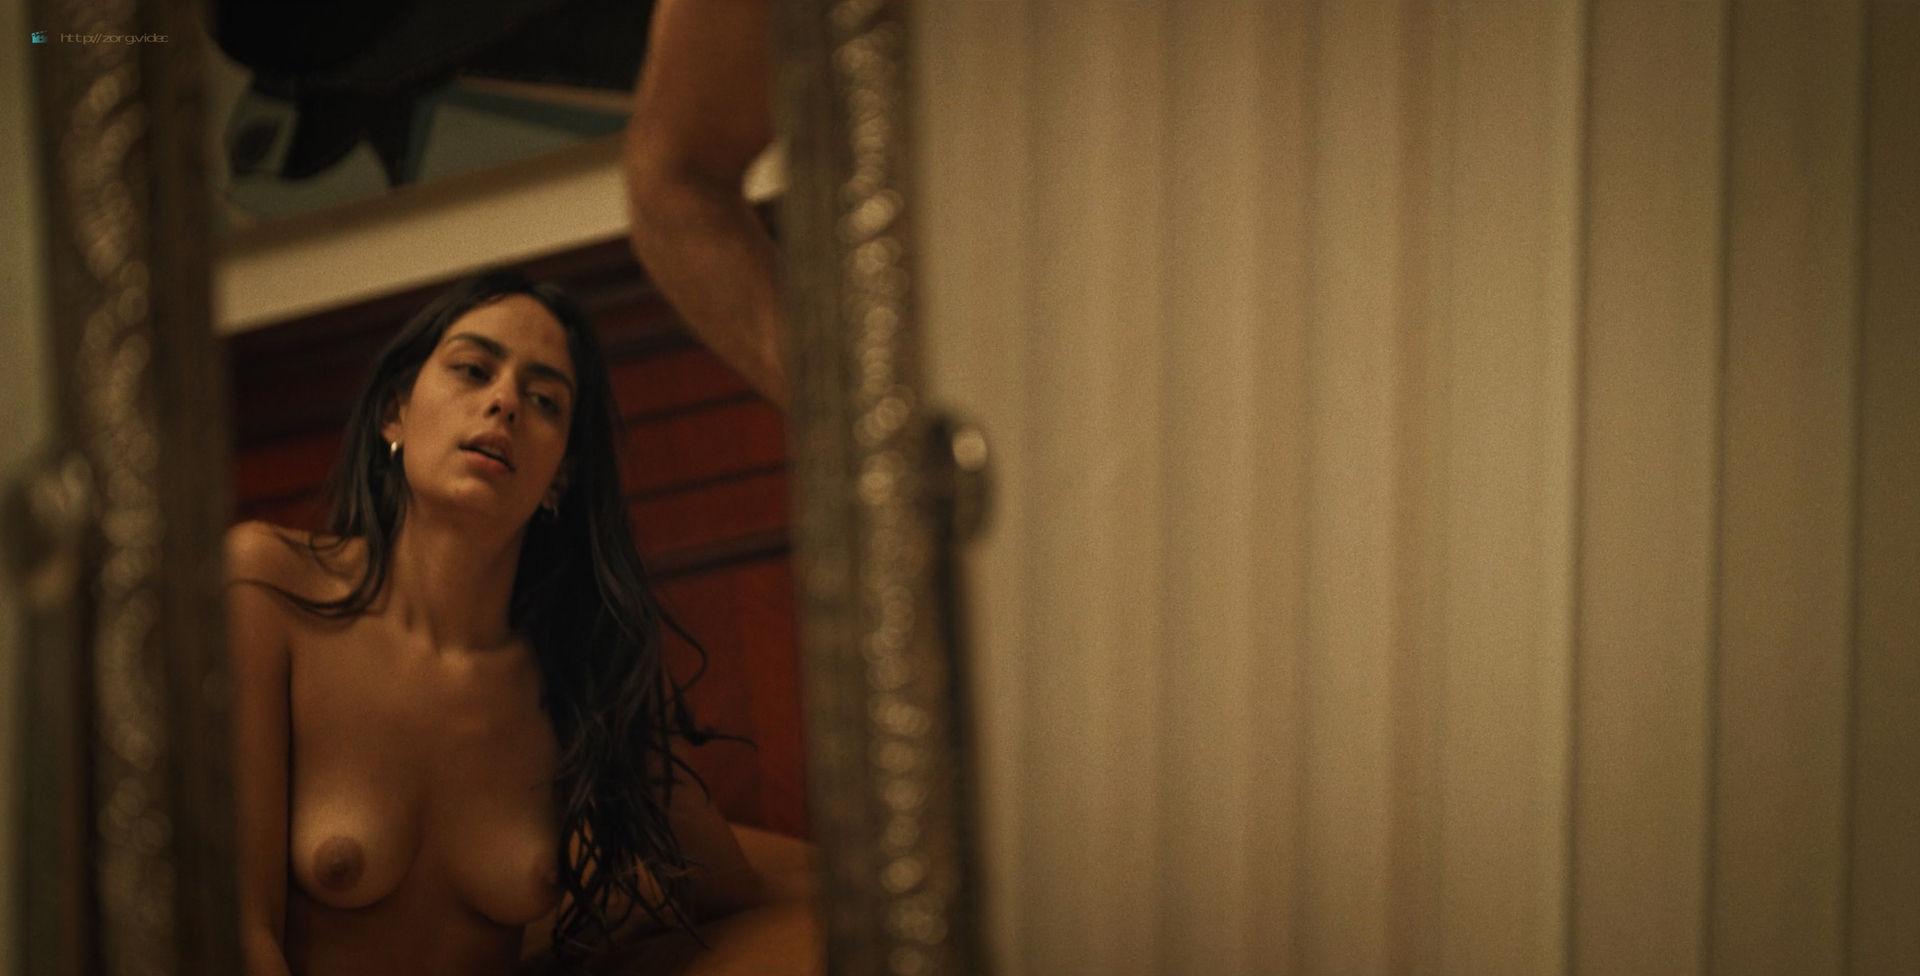 Ana Layevska nude lesbian sex with Florencia Ríos - Yankee (2019) S1 HD 1080p (3)